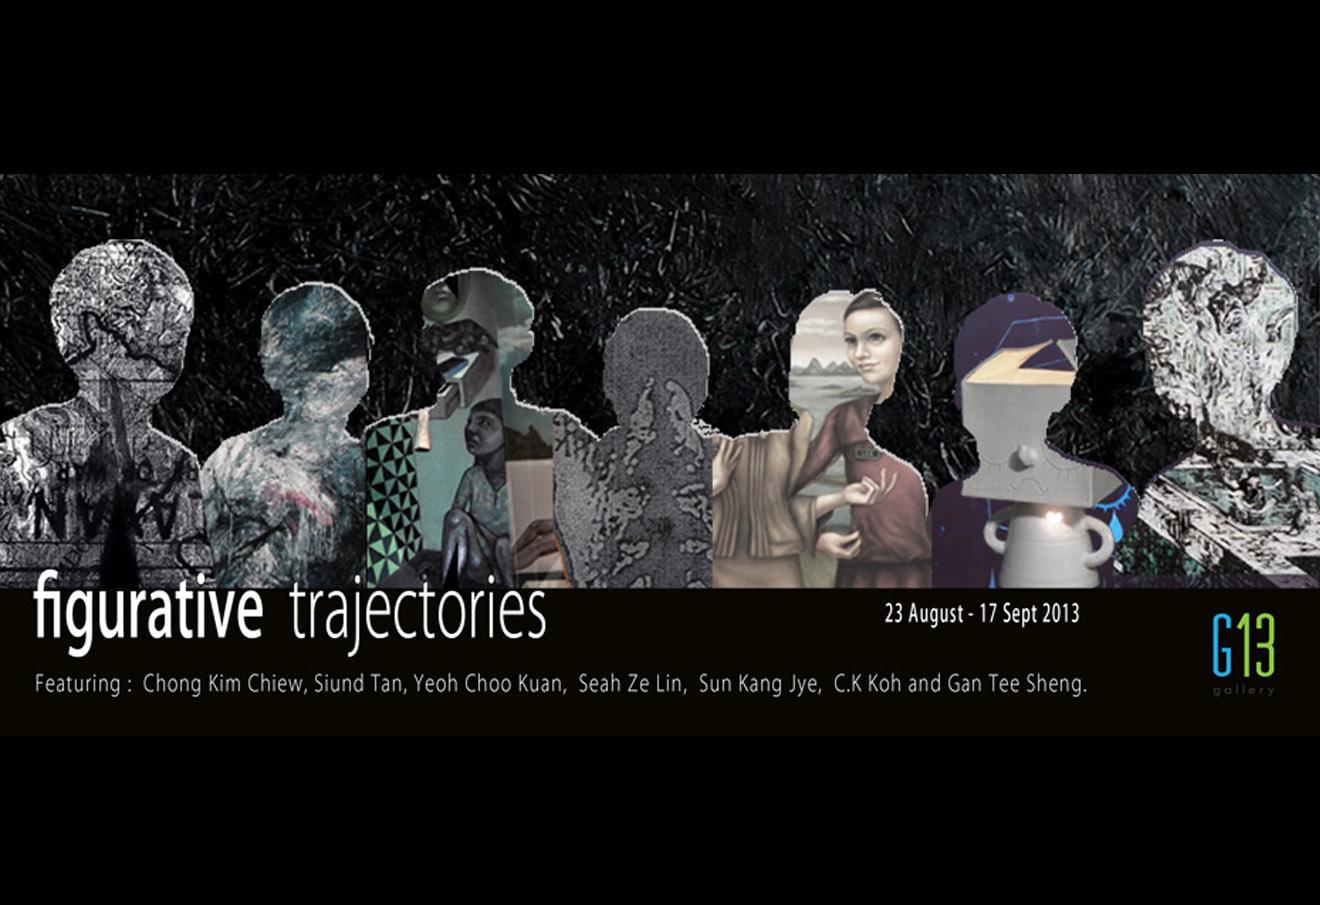 Figurative Trajectories